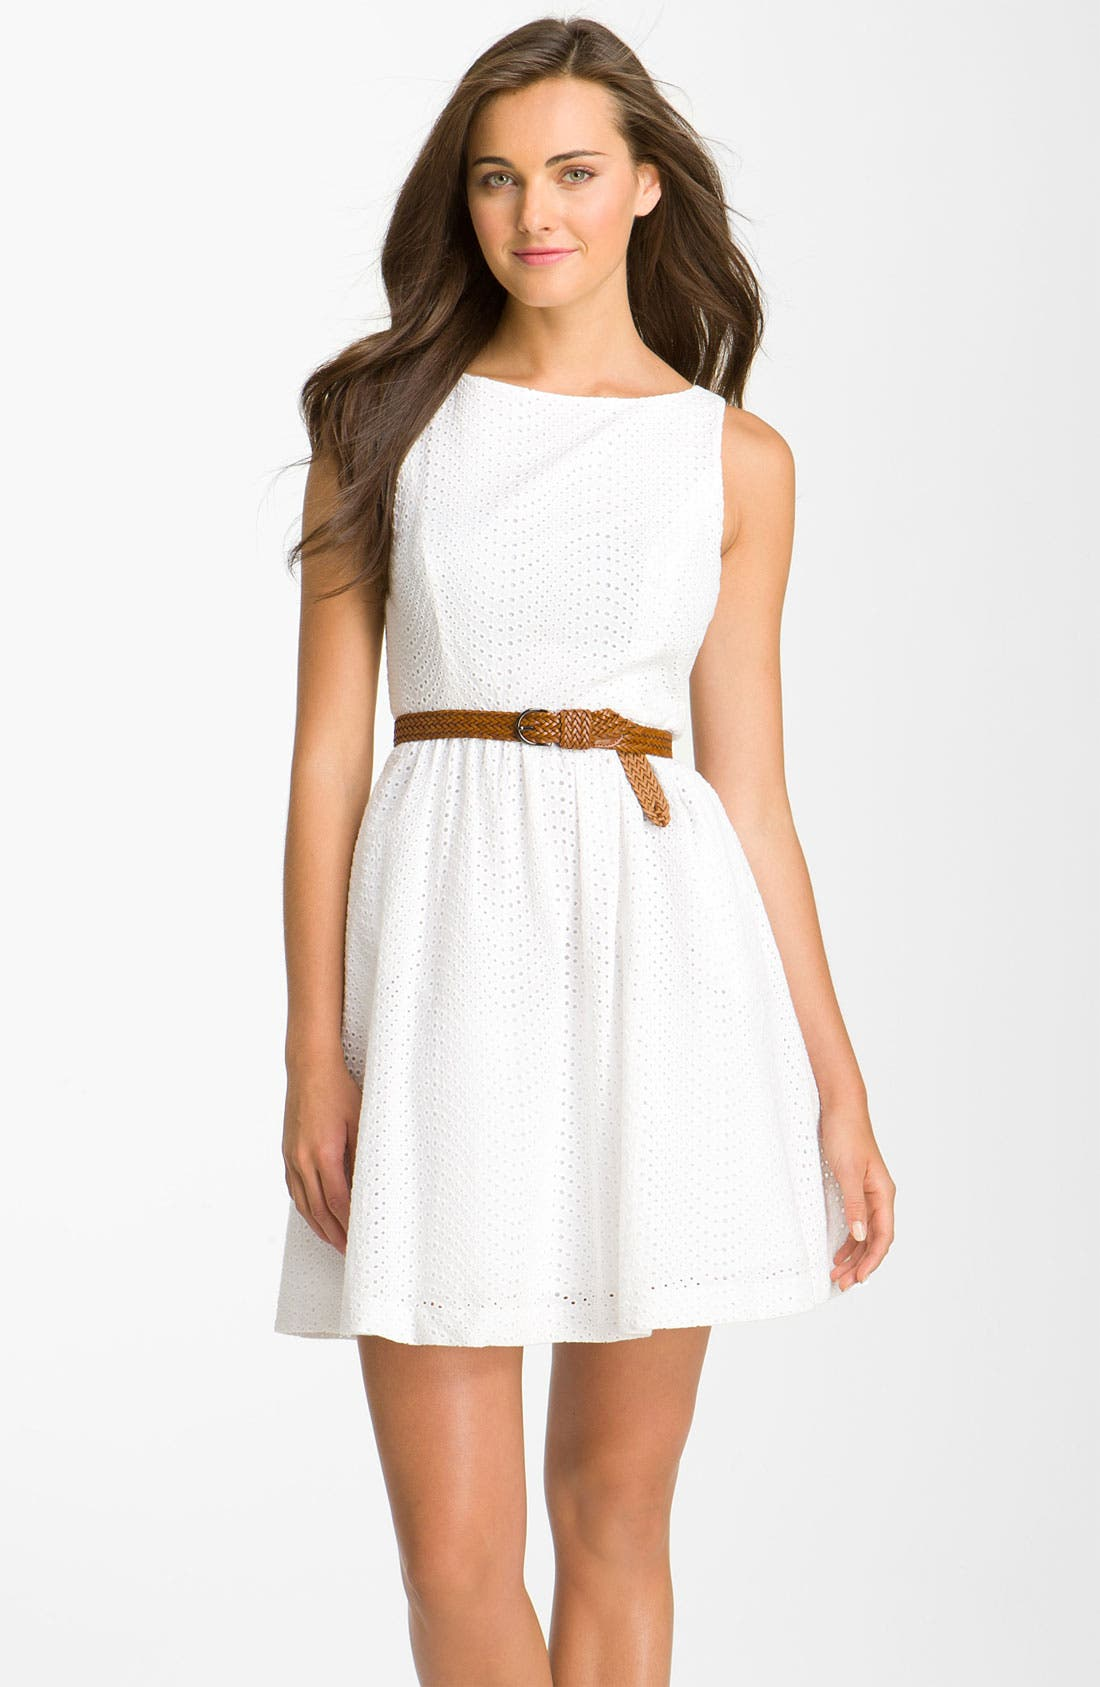 Alternate Image 1 Selected - Jessica Simpson Eyelet Dress